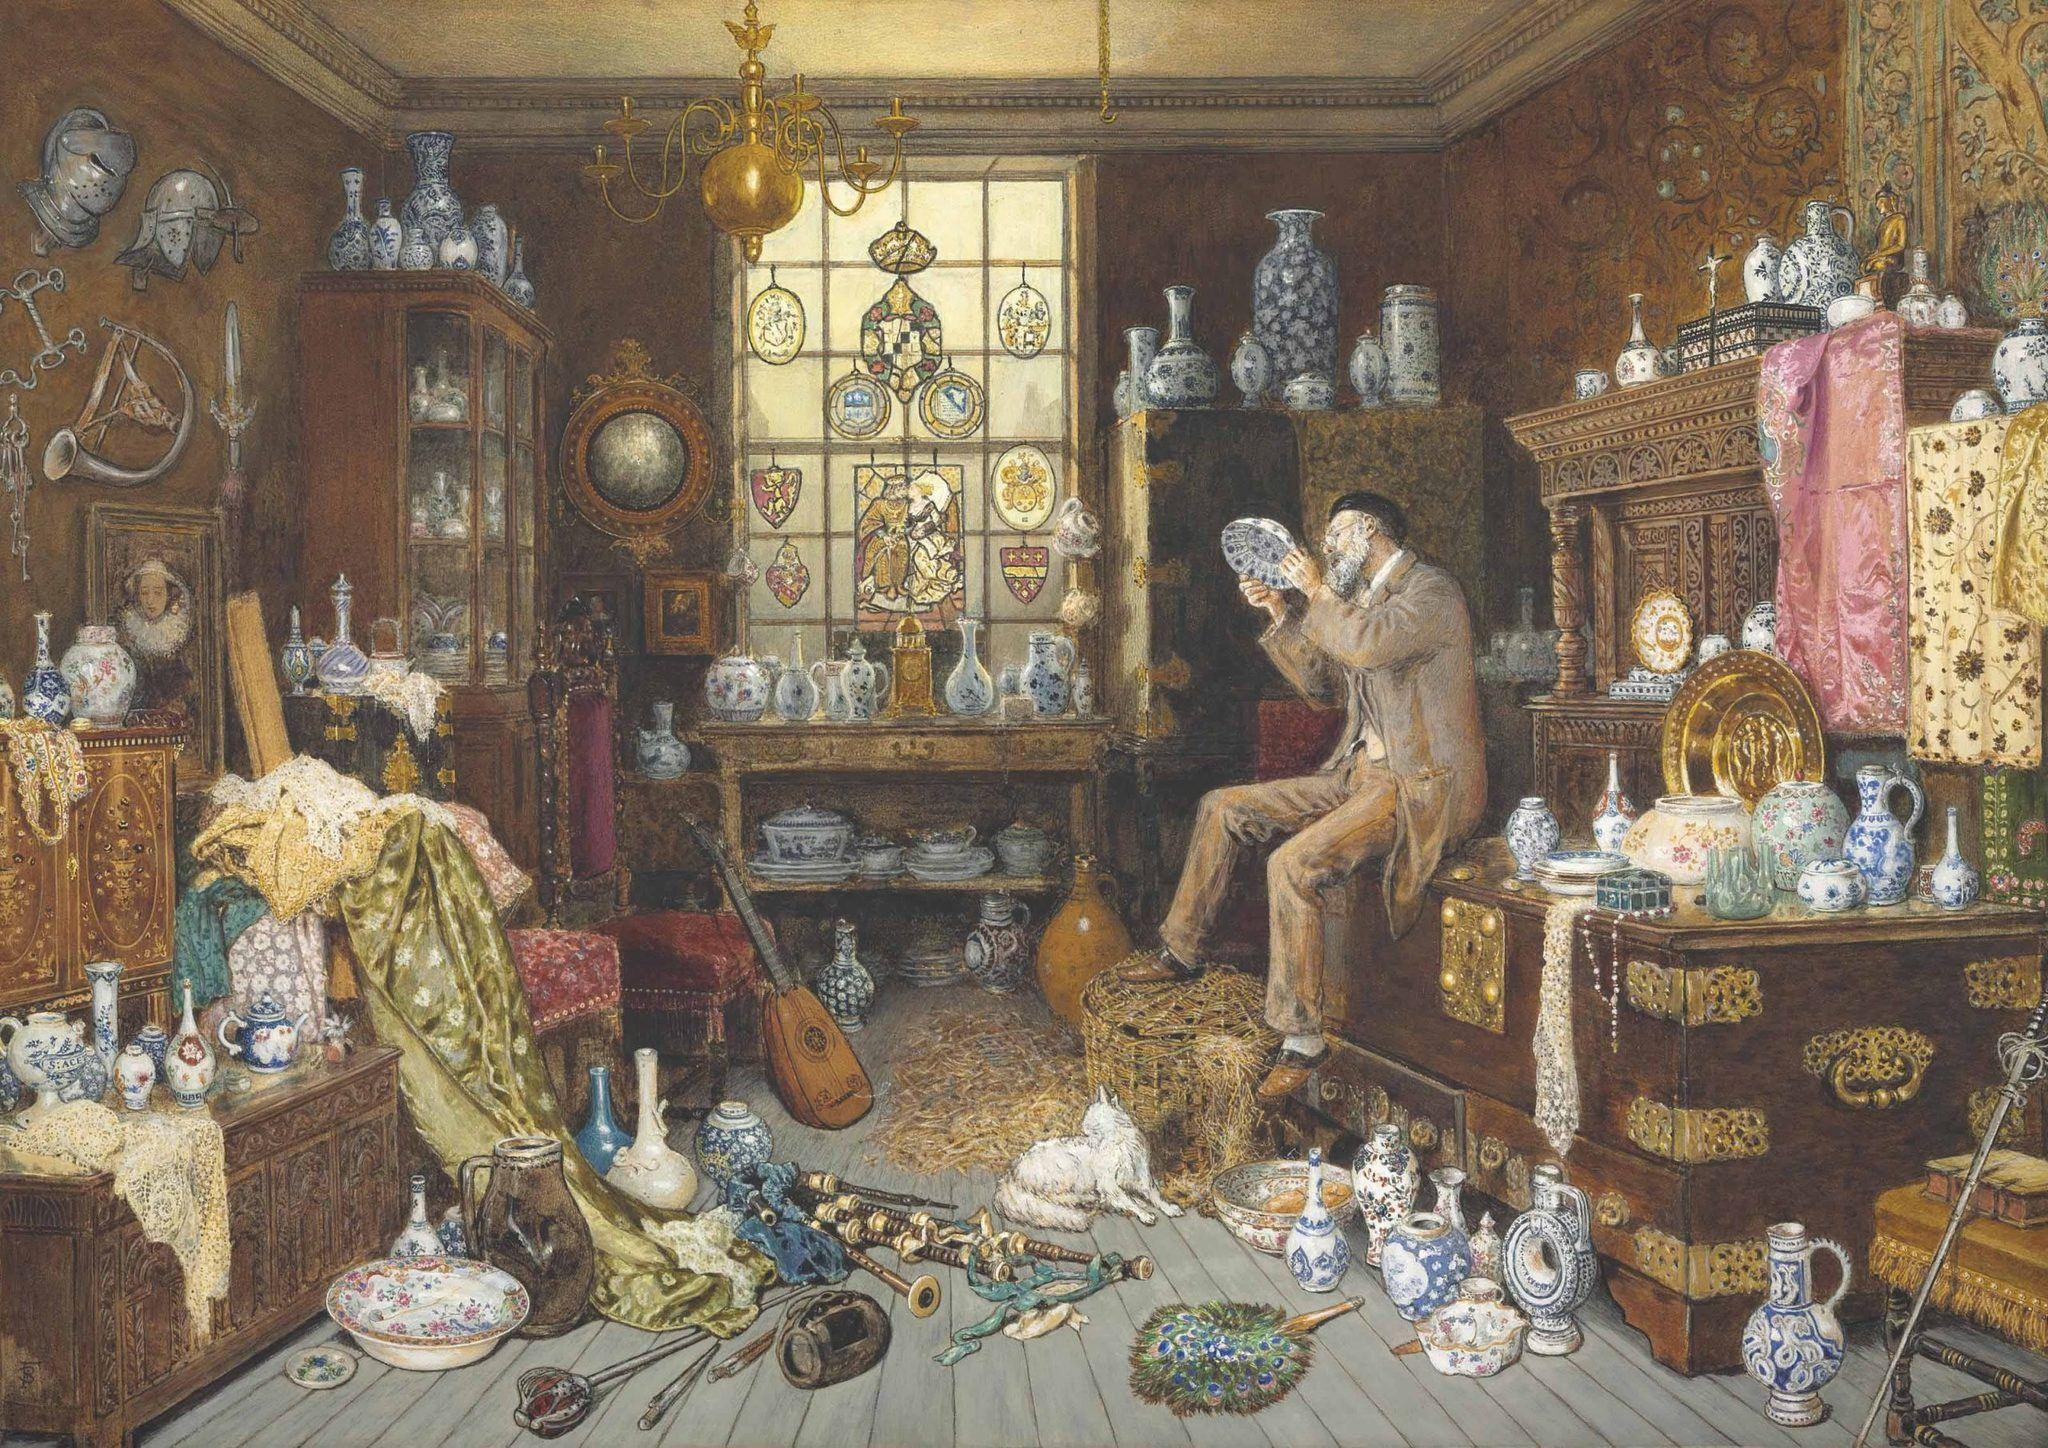 Myles_Birket_Foster_-_The_Old_Curiosity_Shop